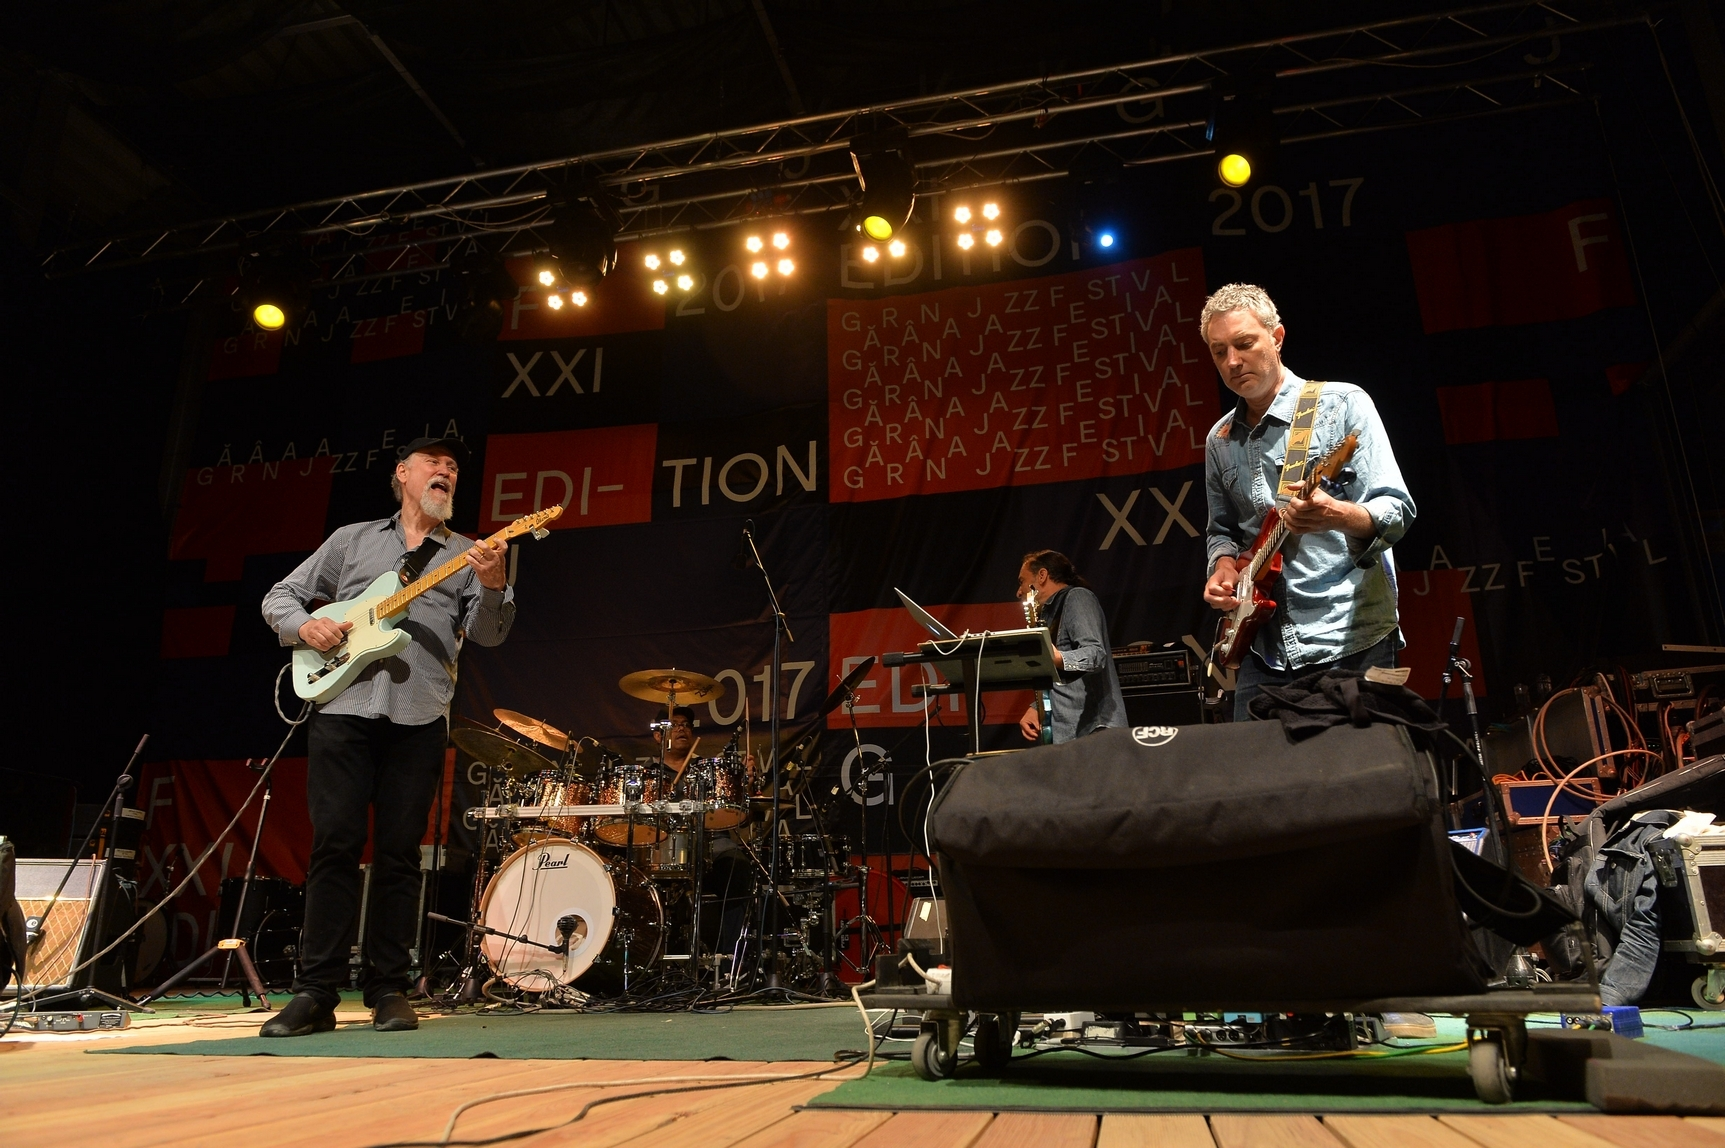 John Scofield Uberjam Band at Garana Jazz Festival 2017